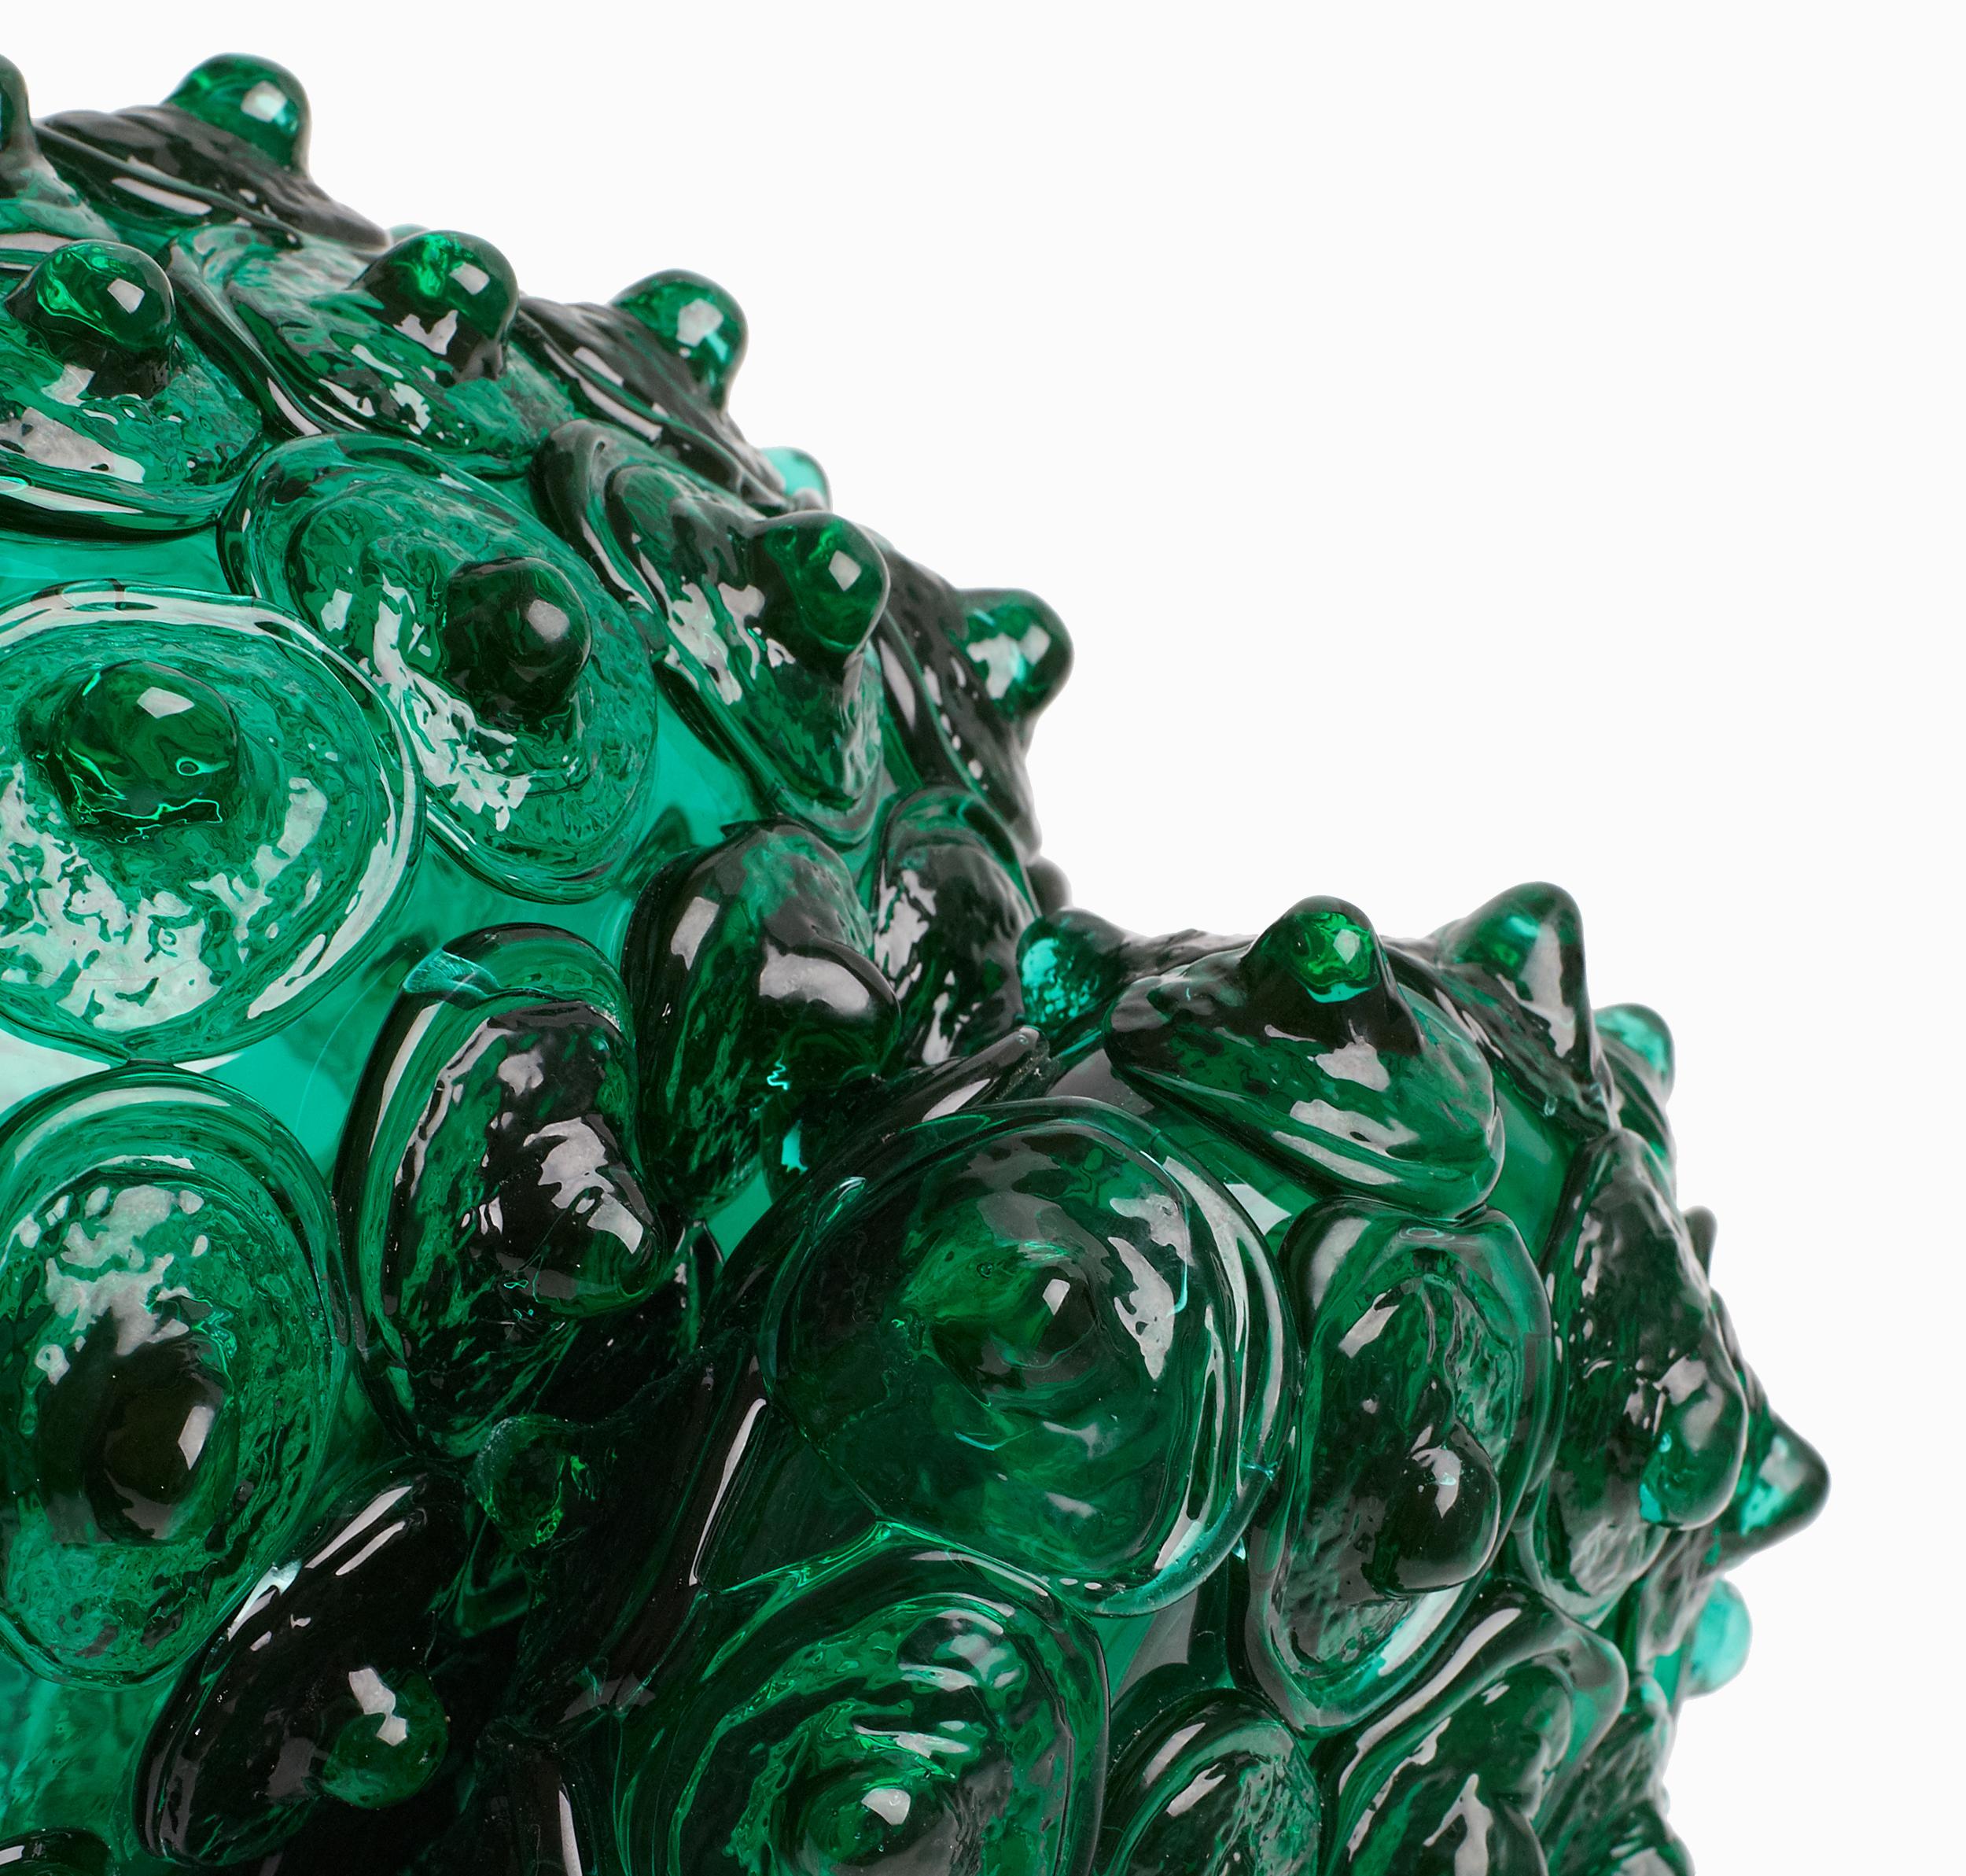 Green double bubble (detail), Katherine Rutecki, 2016